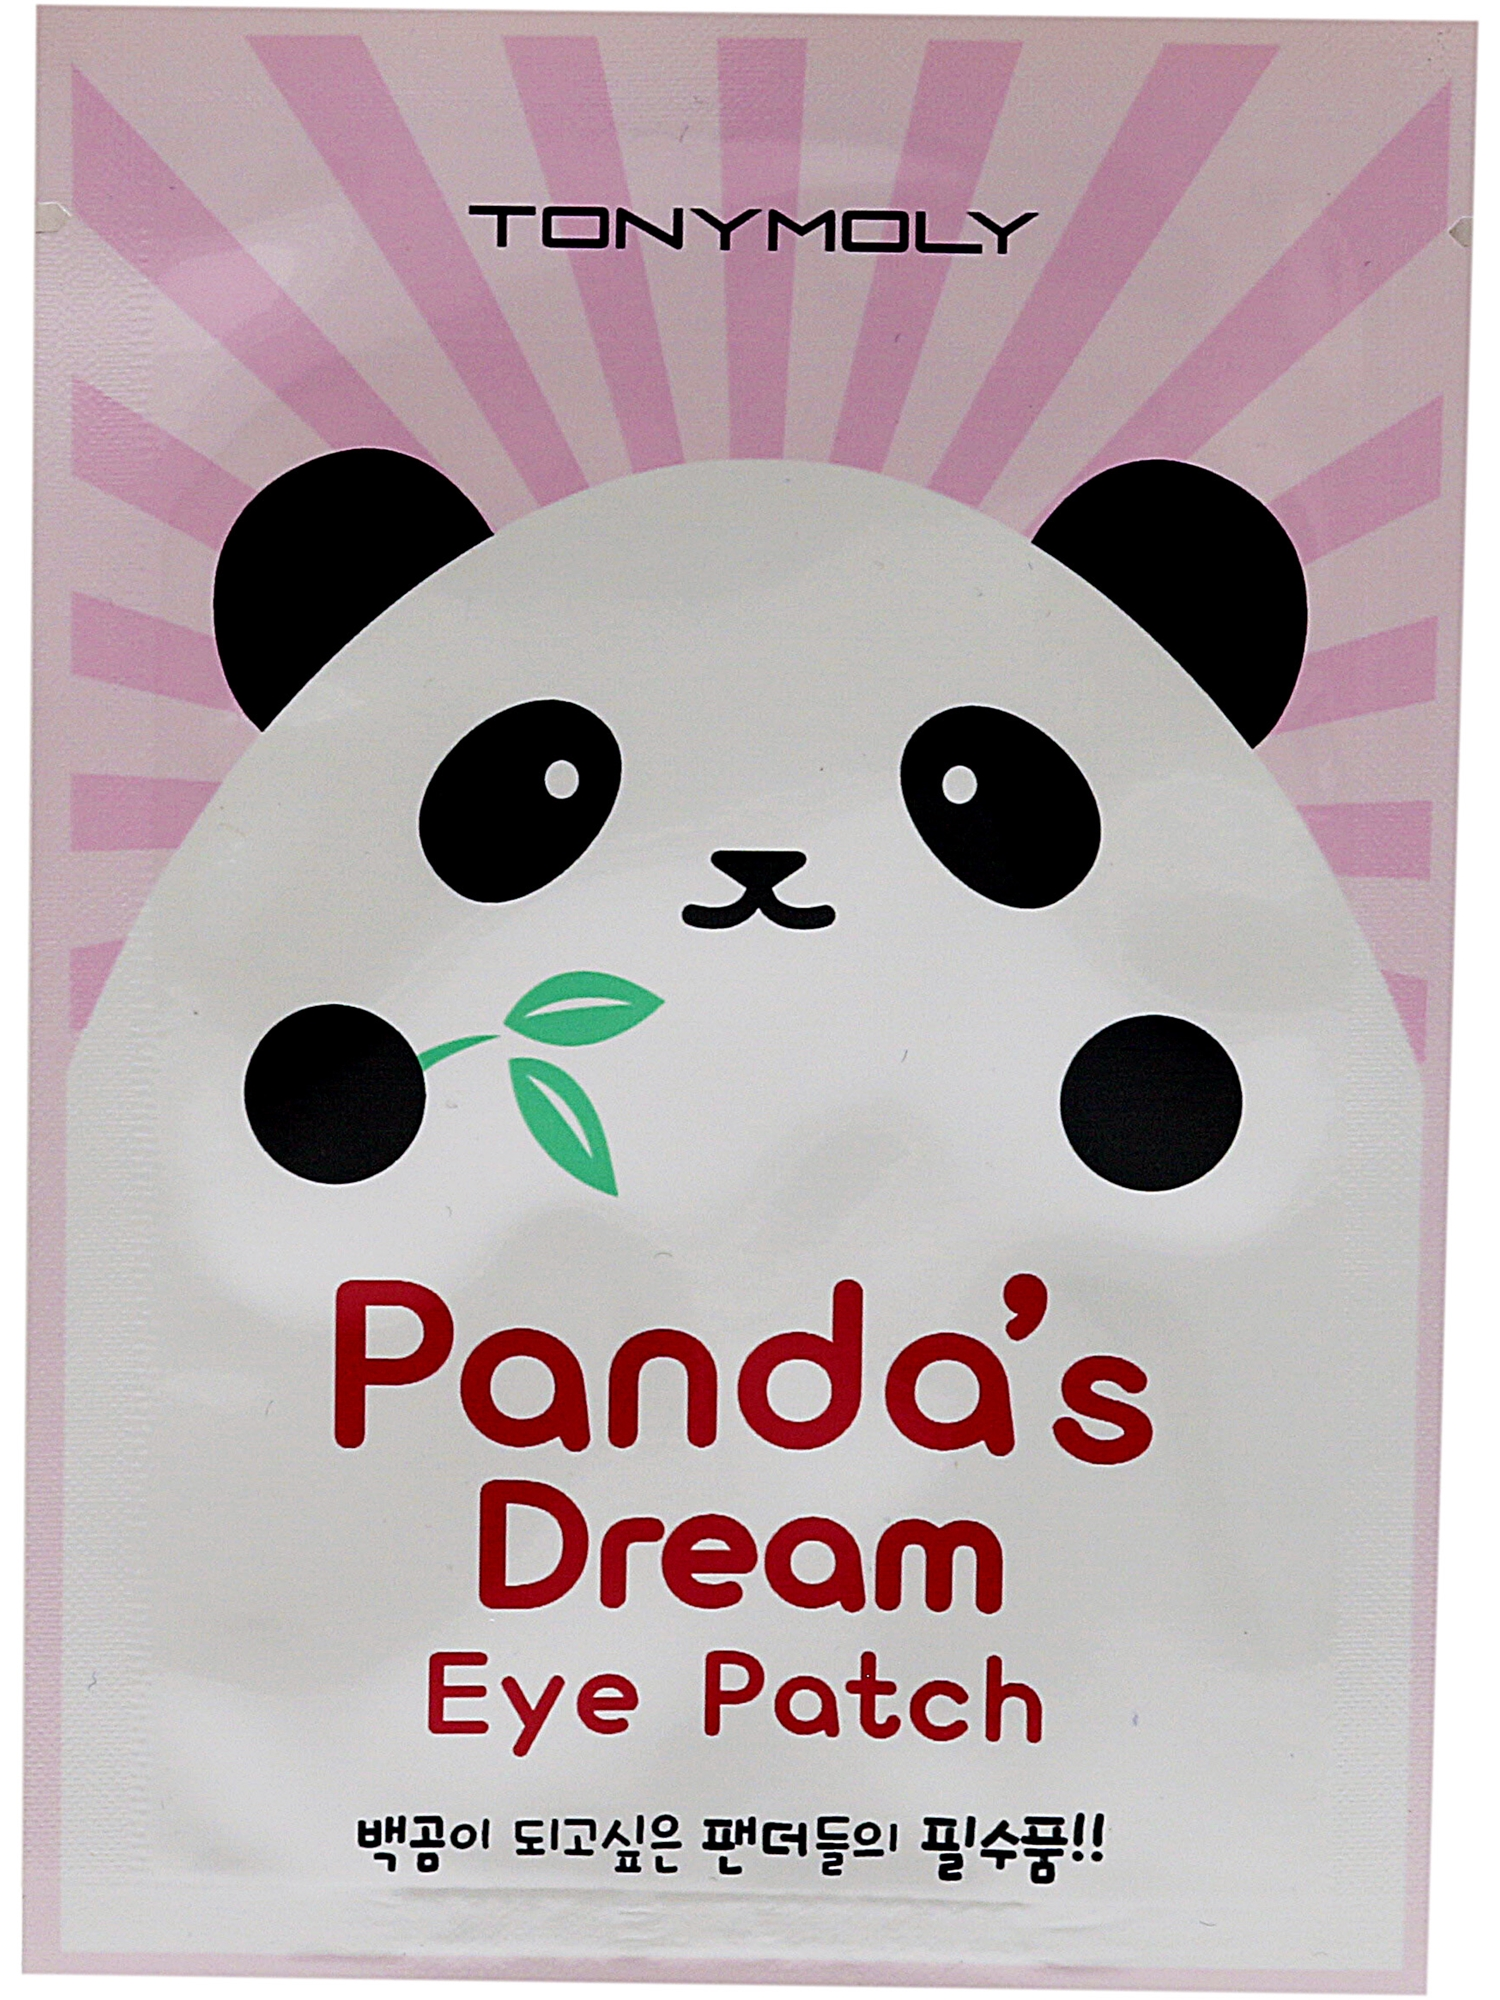 Tonymoly Women's Panda's Dream Eye Patch Facial Mask TONW-PANDA'SDREAME-PINK80